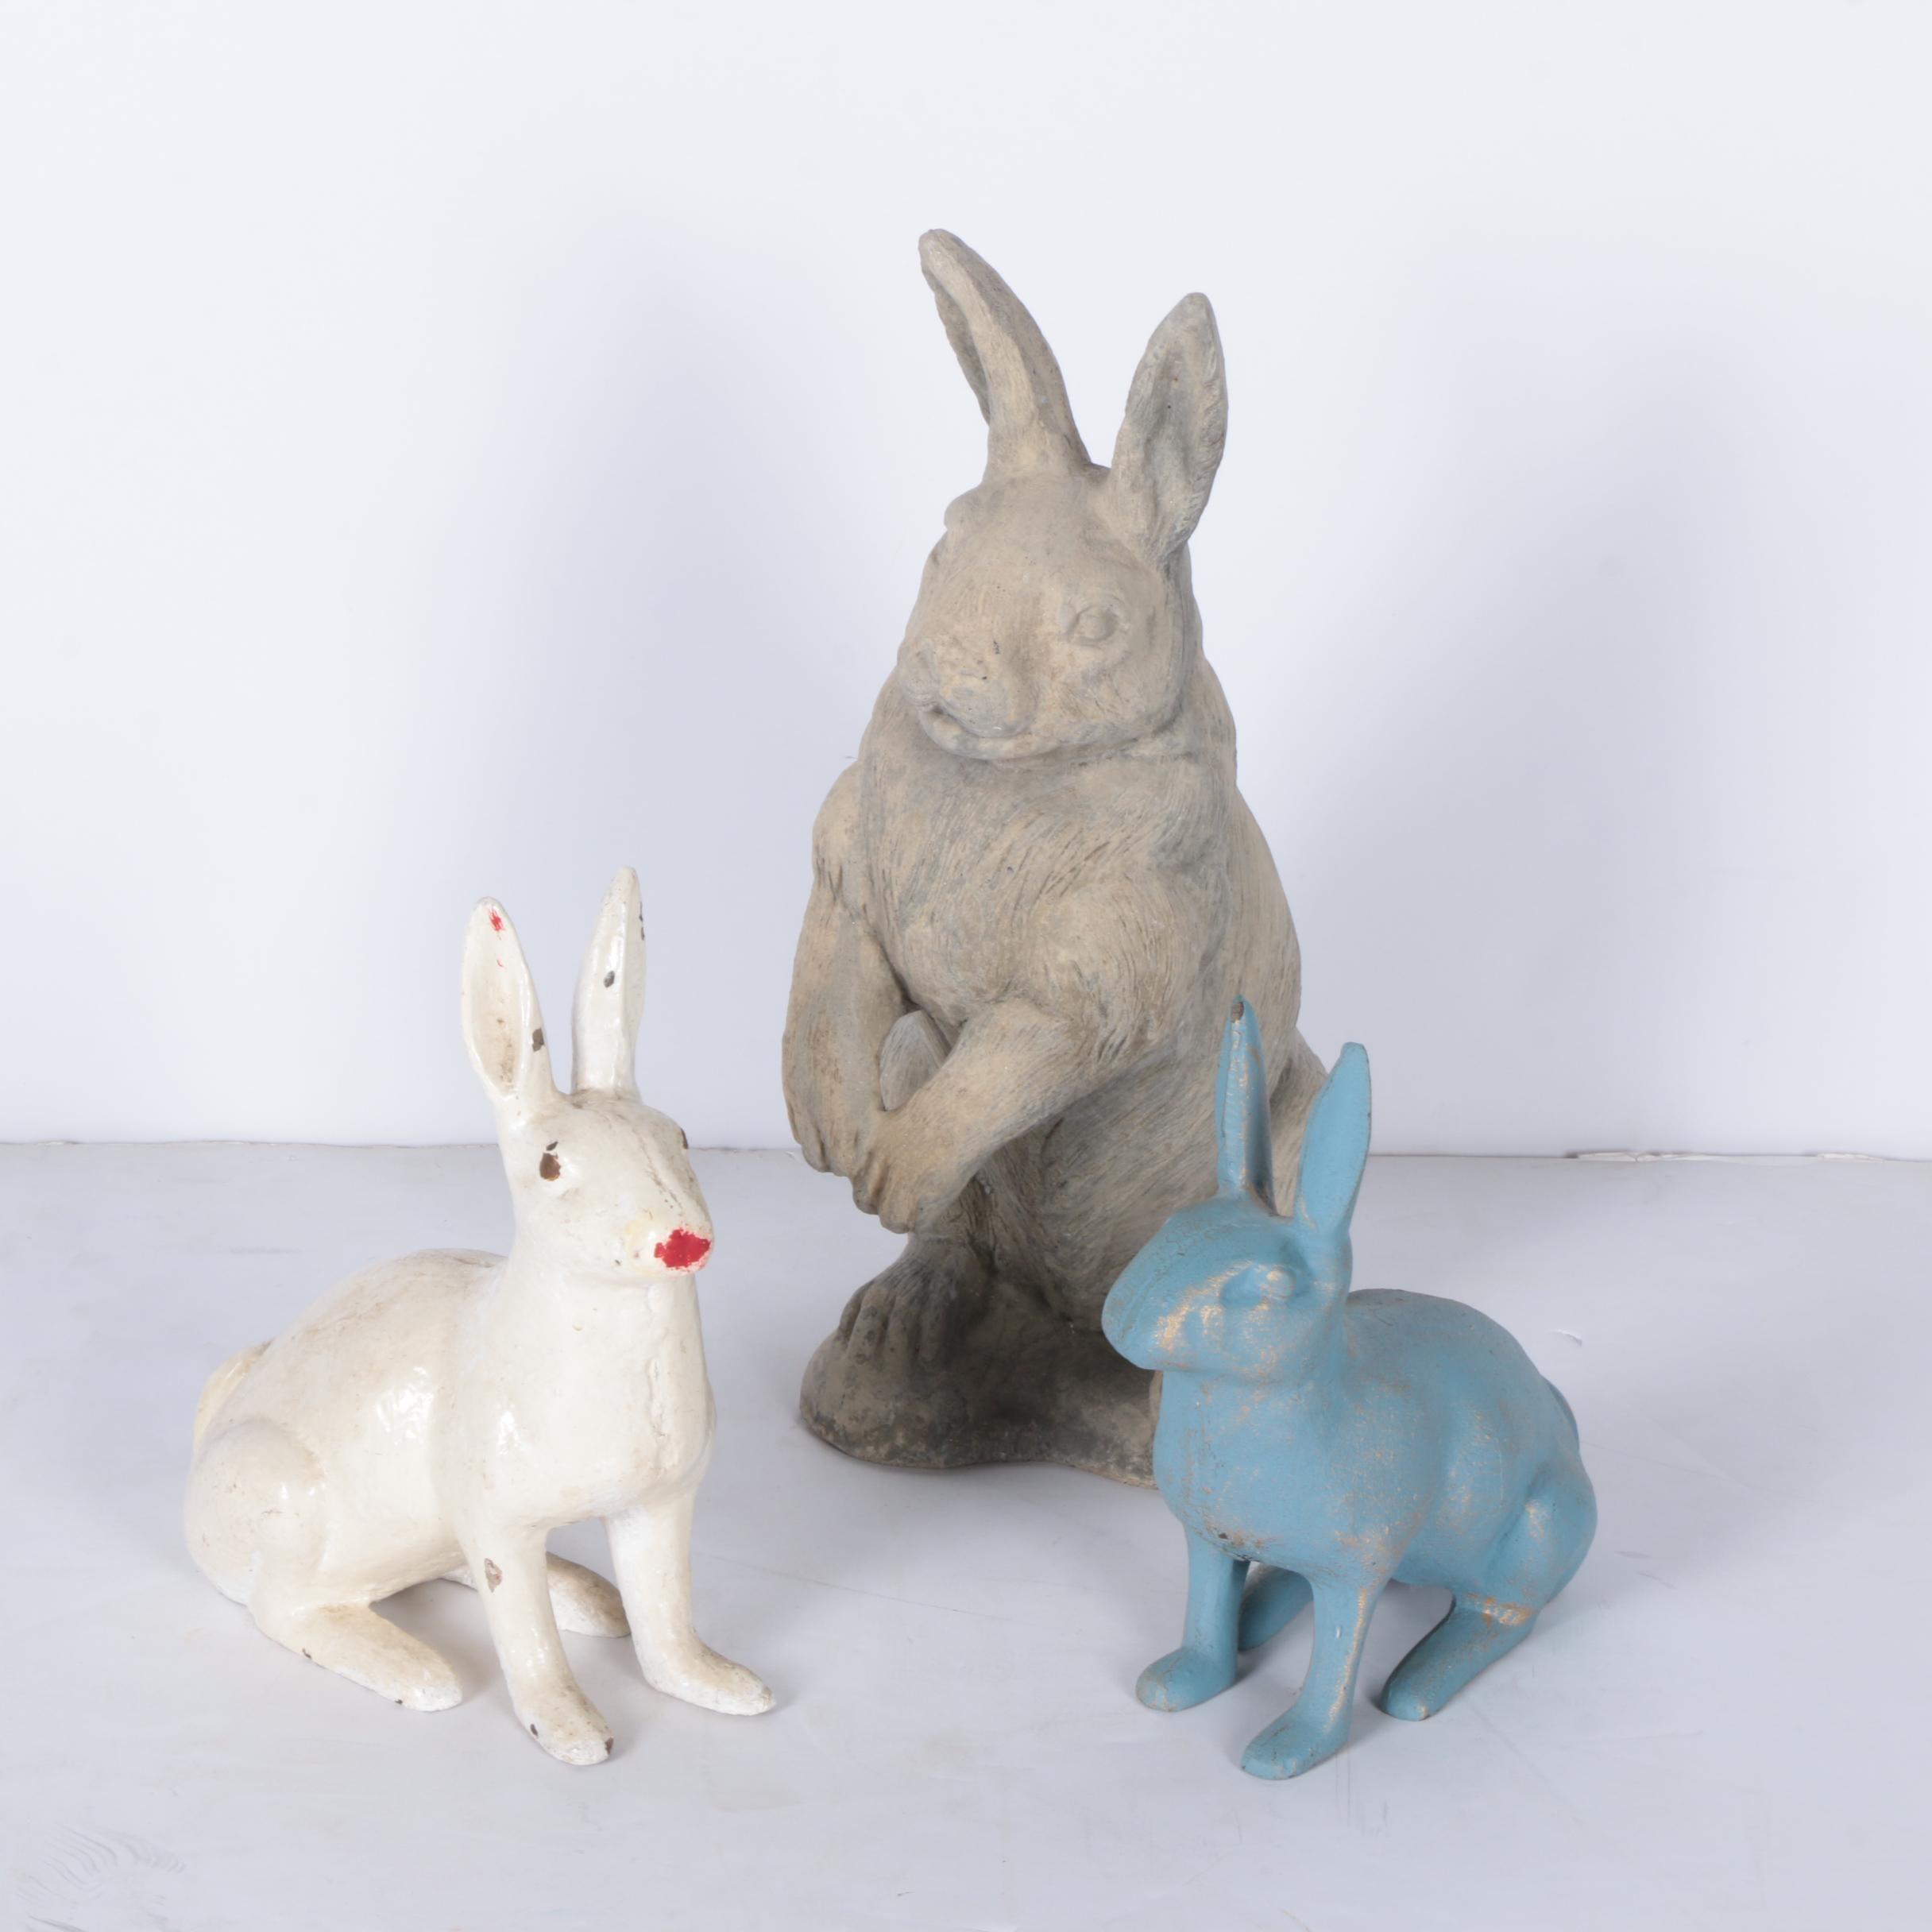 Cement Rabbit Garden Statues